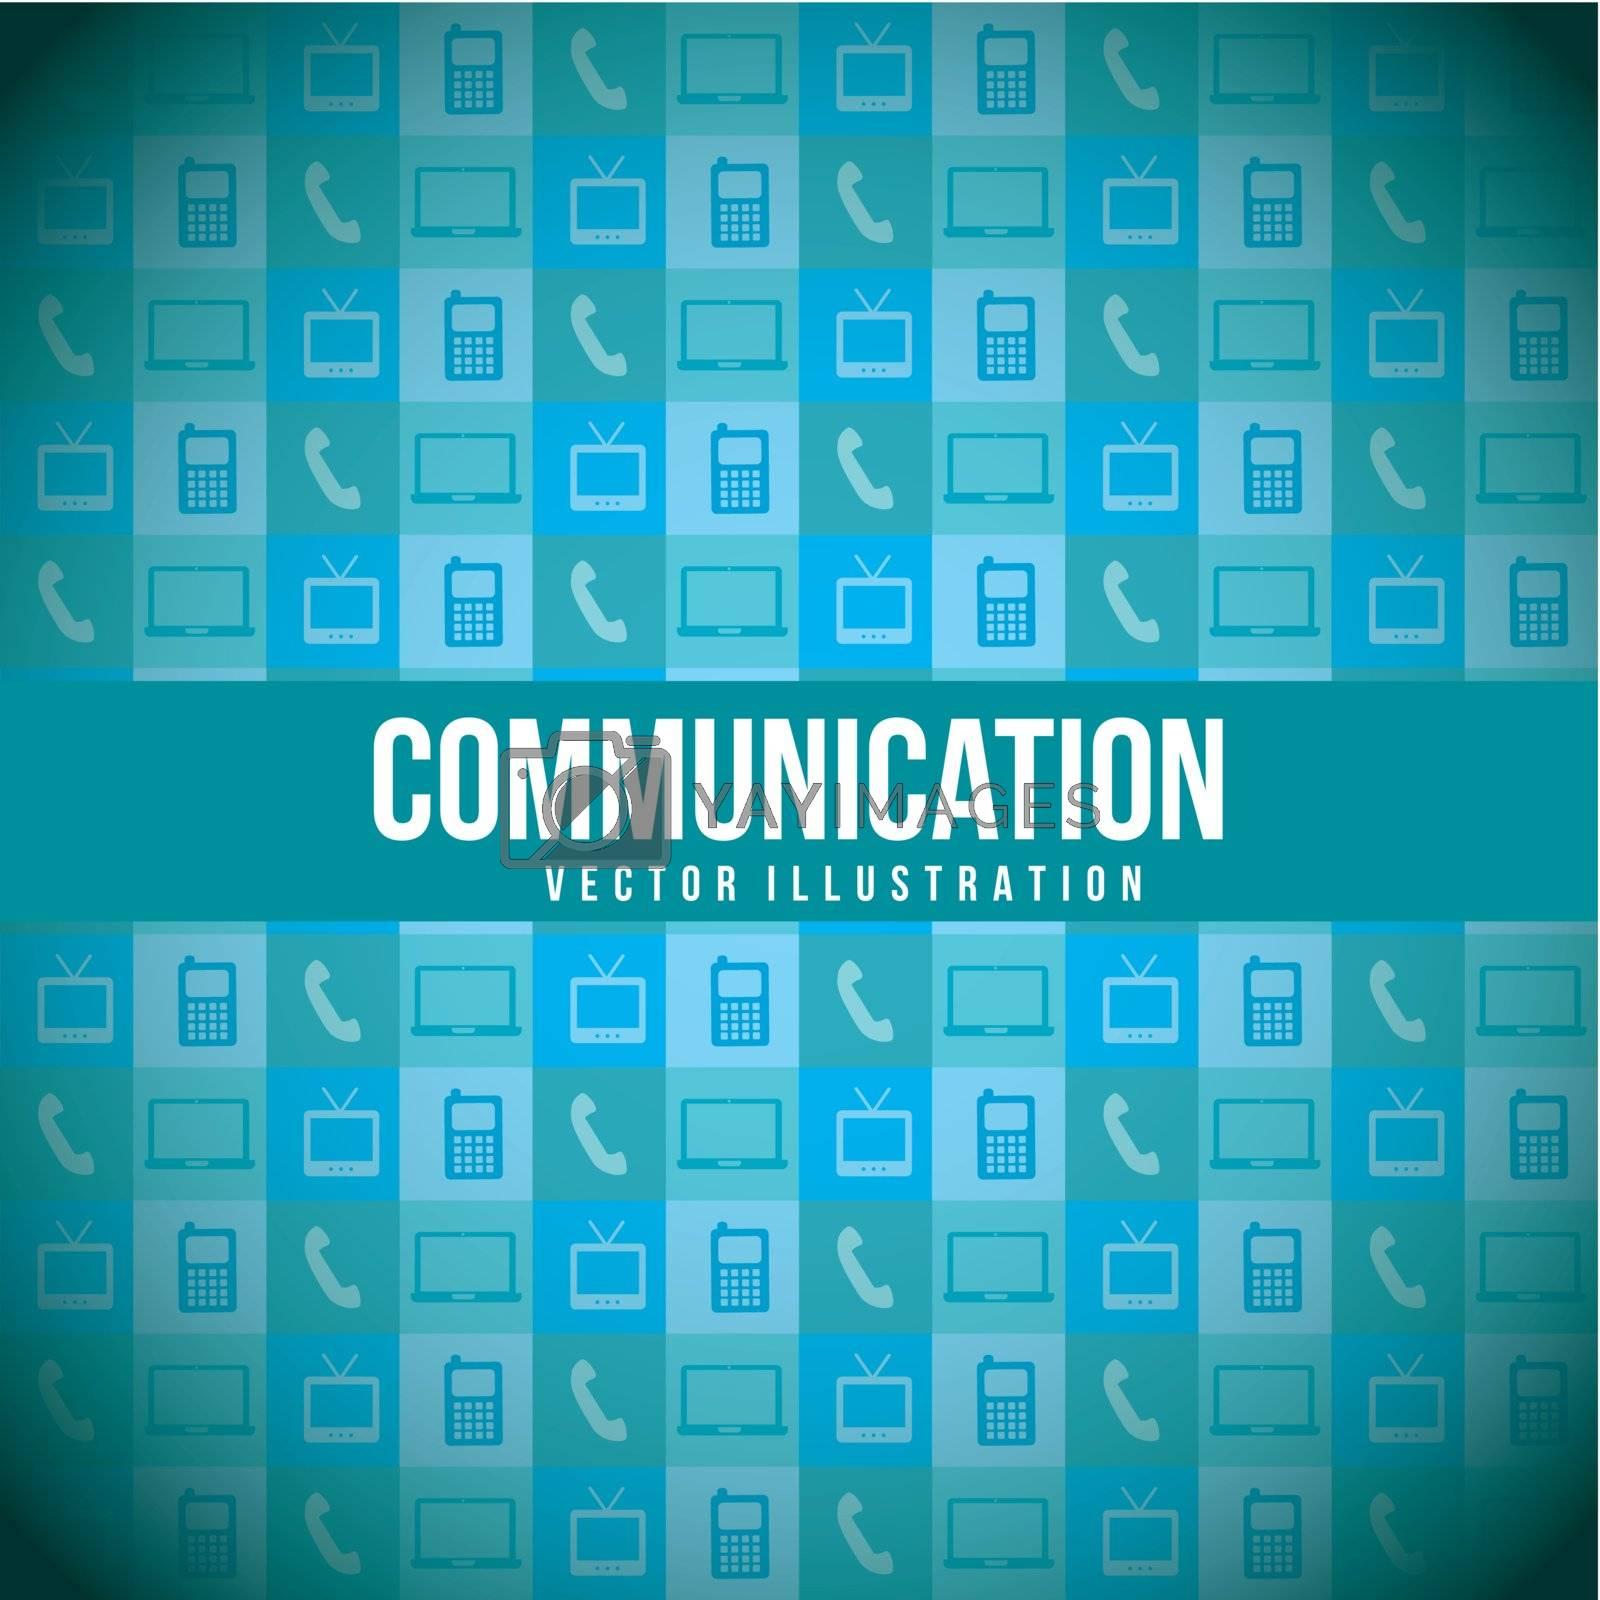 communication icons over blue background. vector illustration